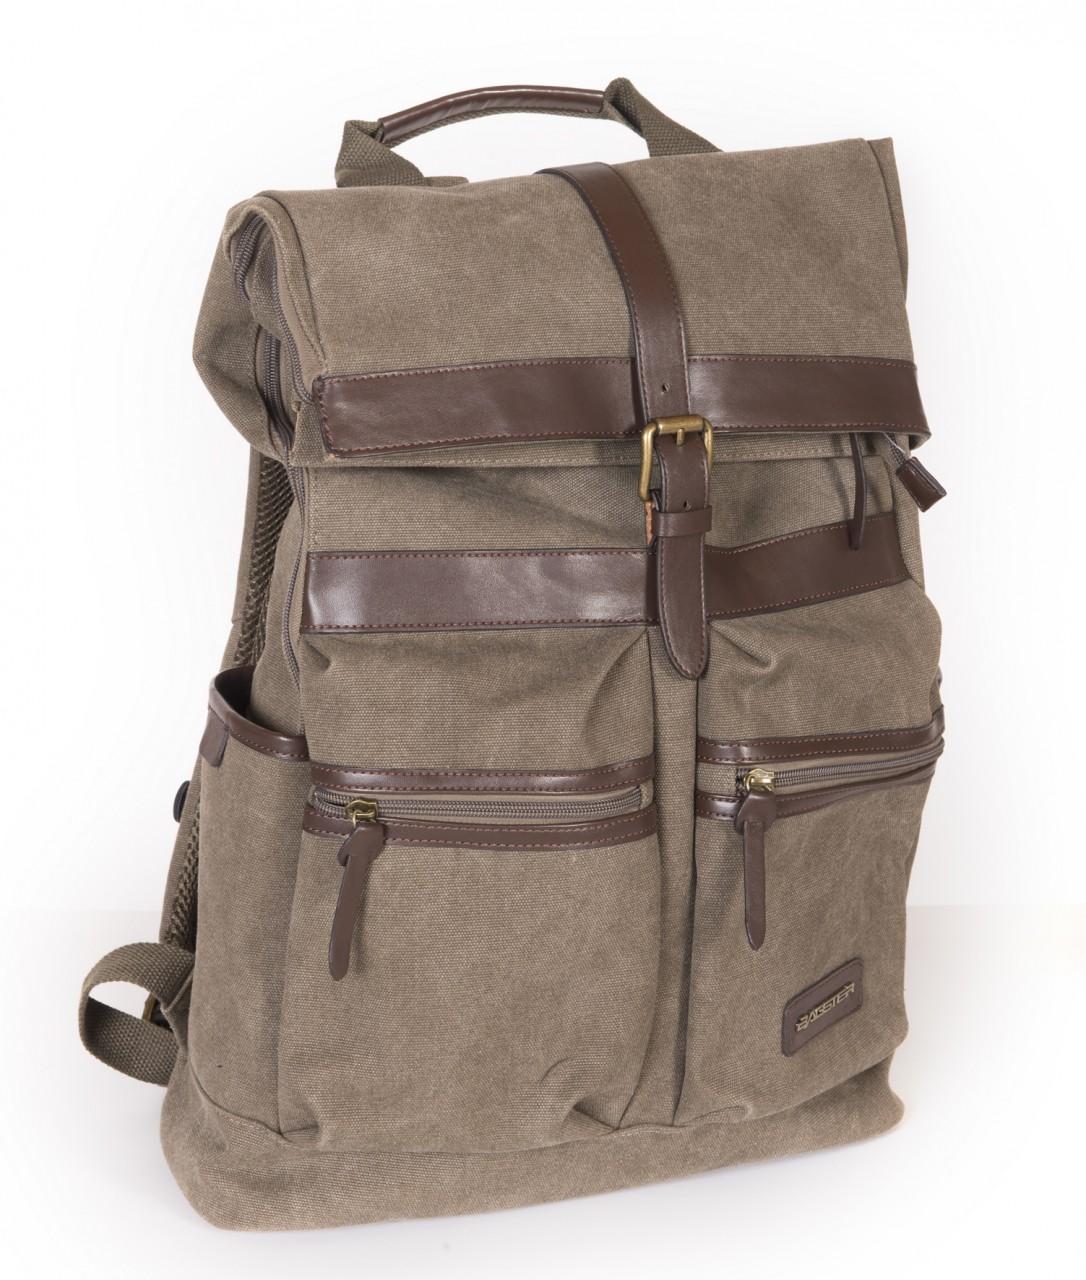 chez bagster le sac dos devient aussi vintage objectif moto. Black Bedroom Furniture Sets. Home Design Ideas